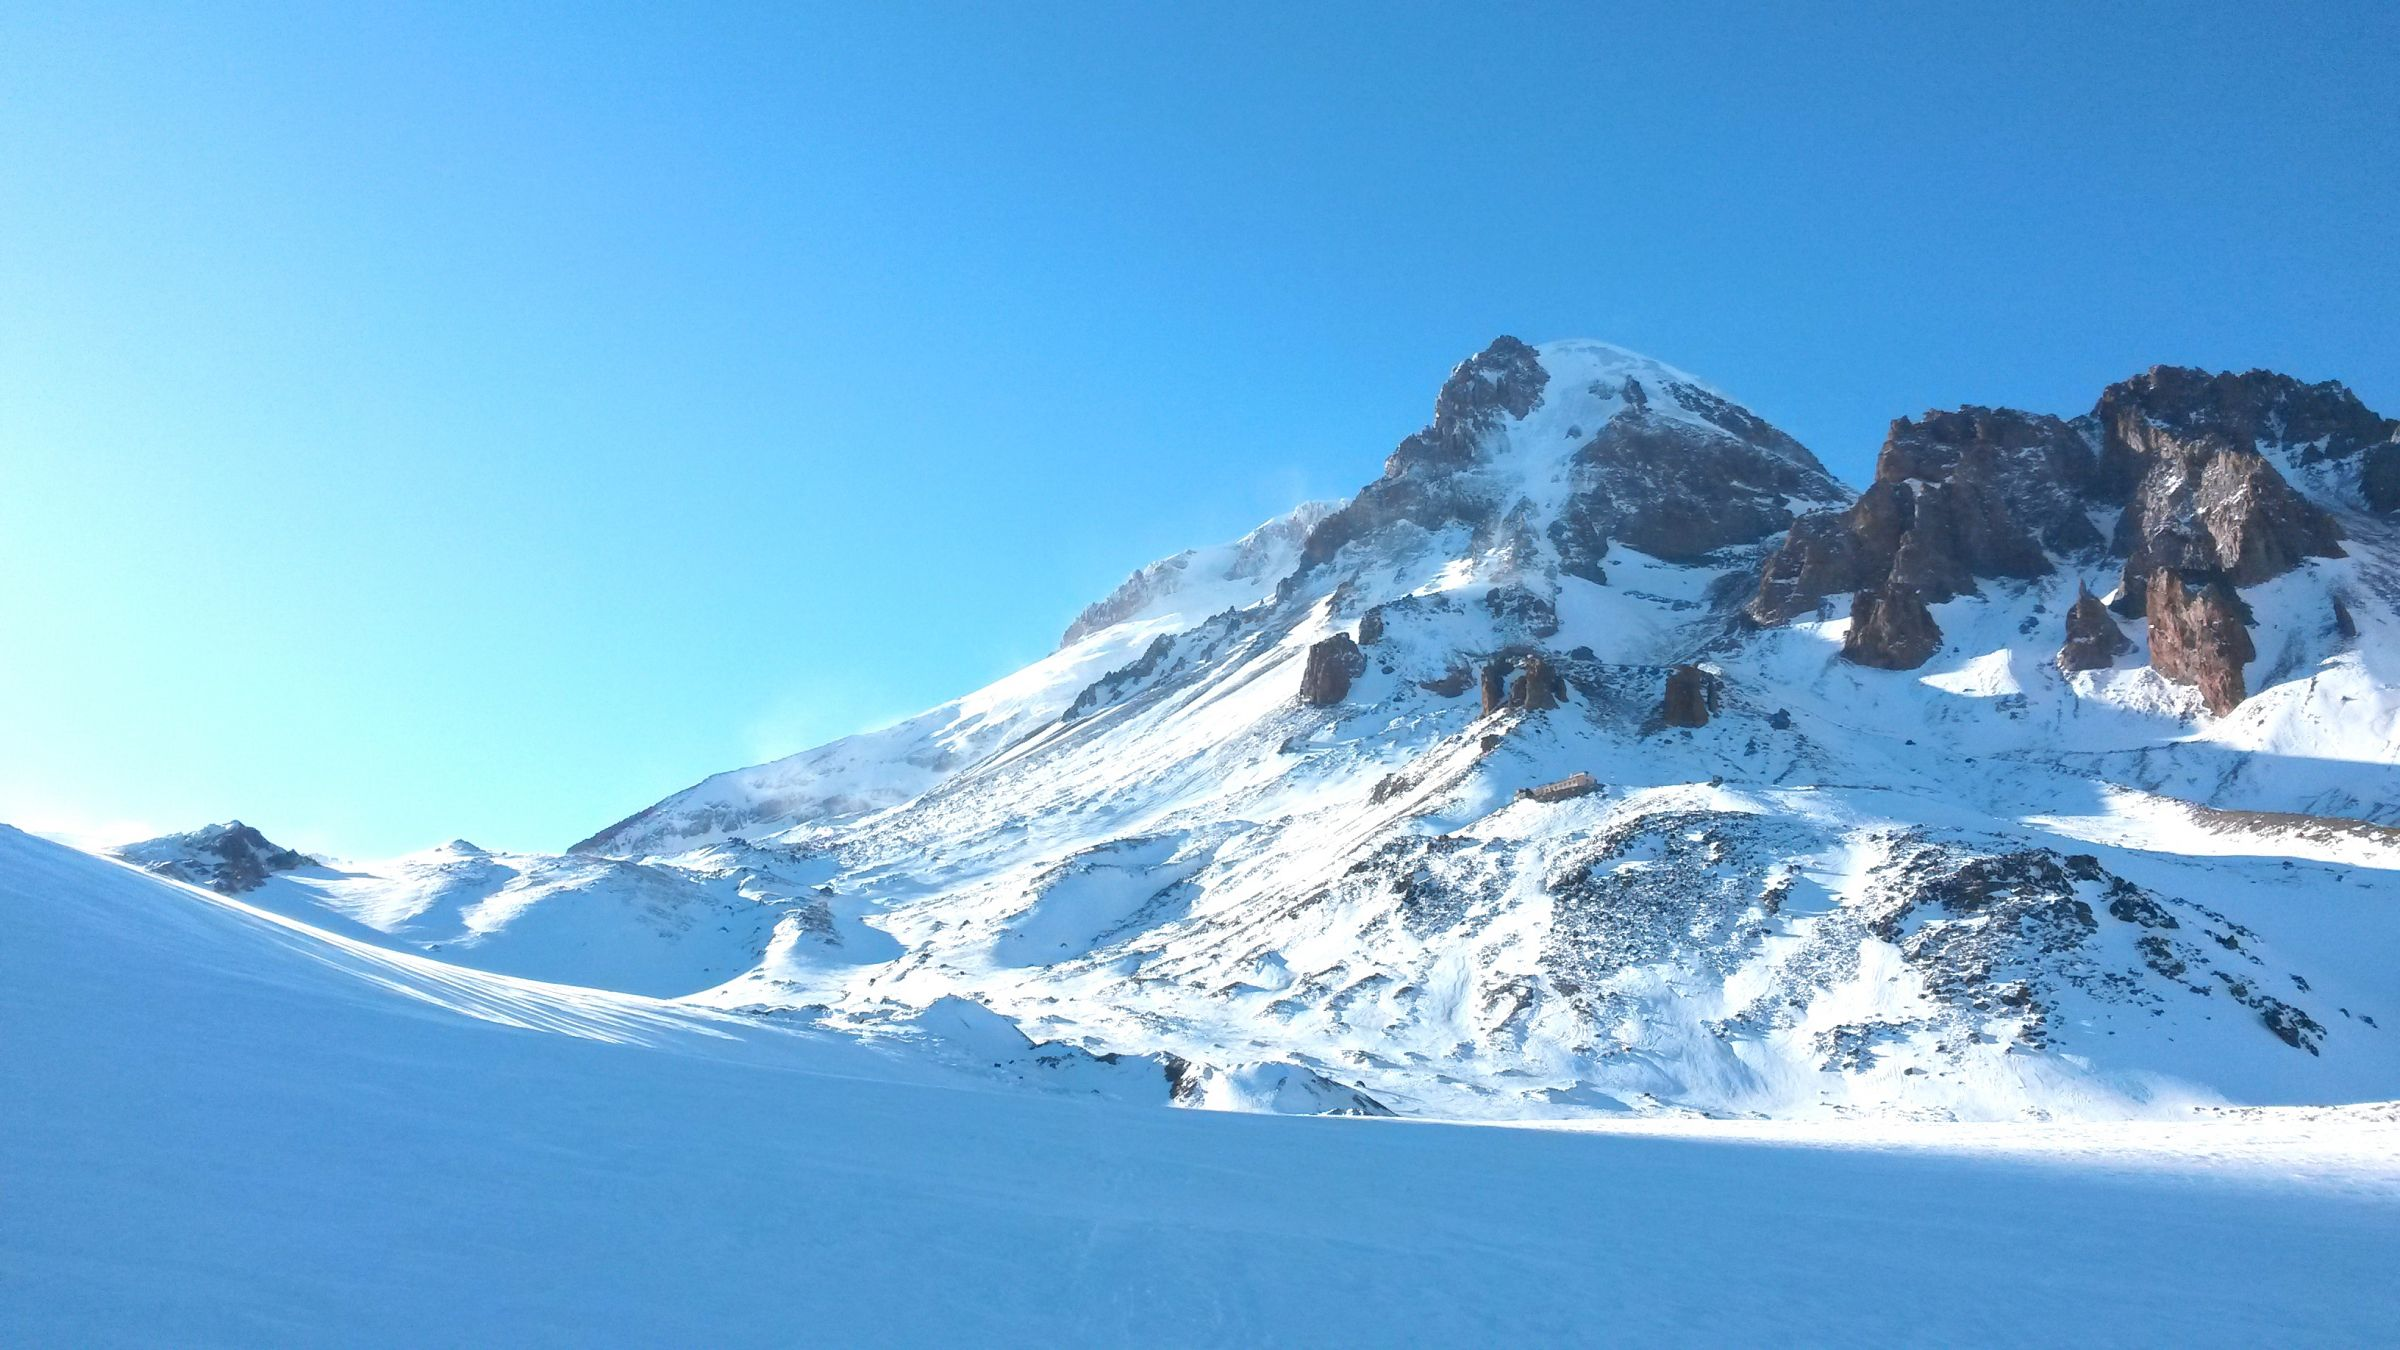 Ски-тур на Казбеке: пейзажи Казбек